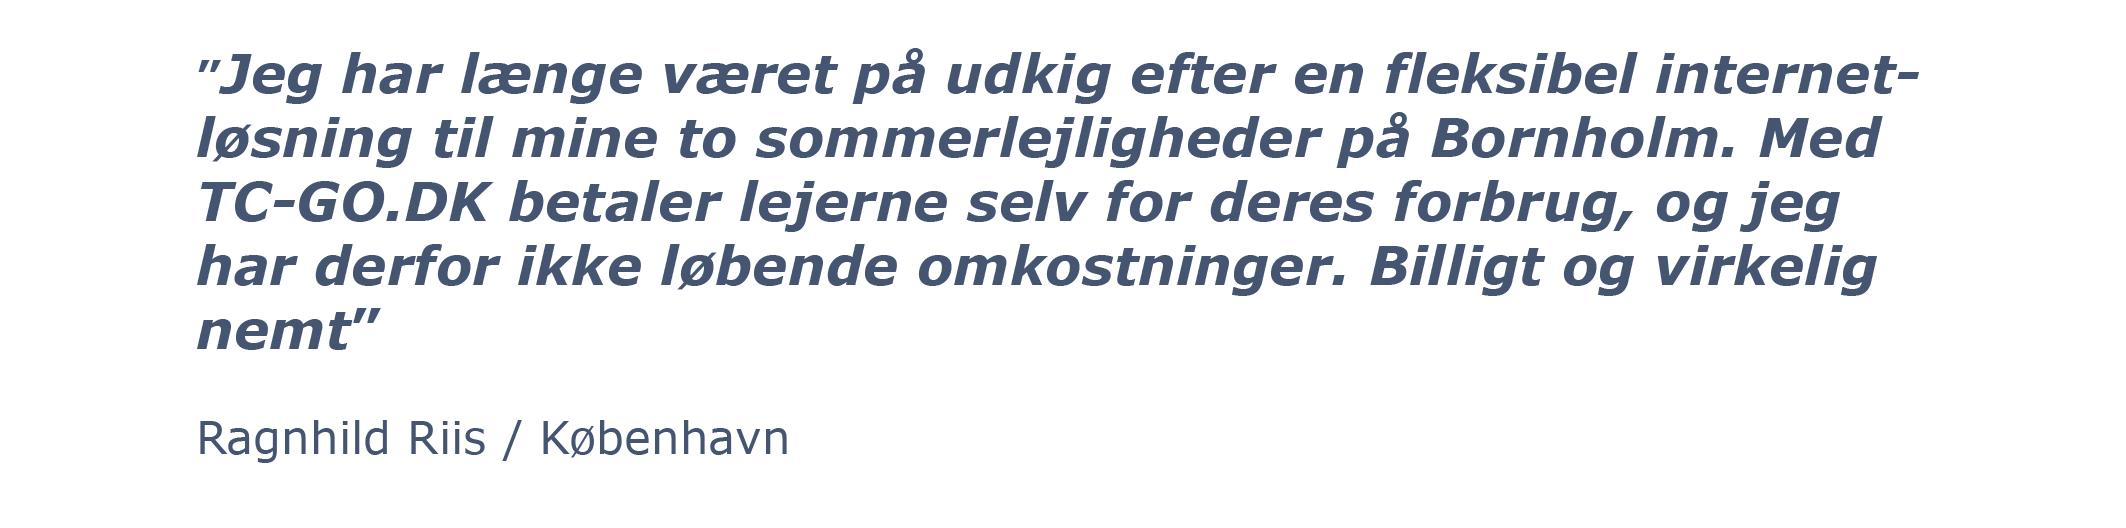 Ragnhild Riis-03.jpg